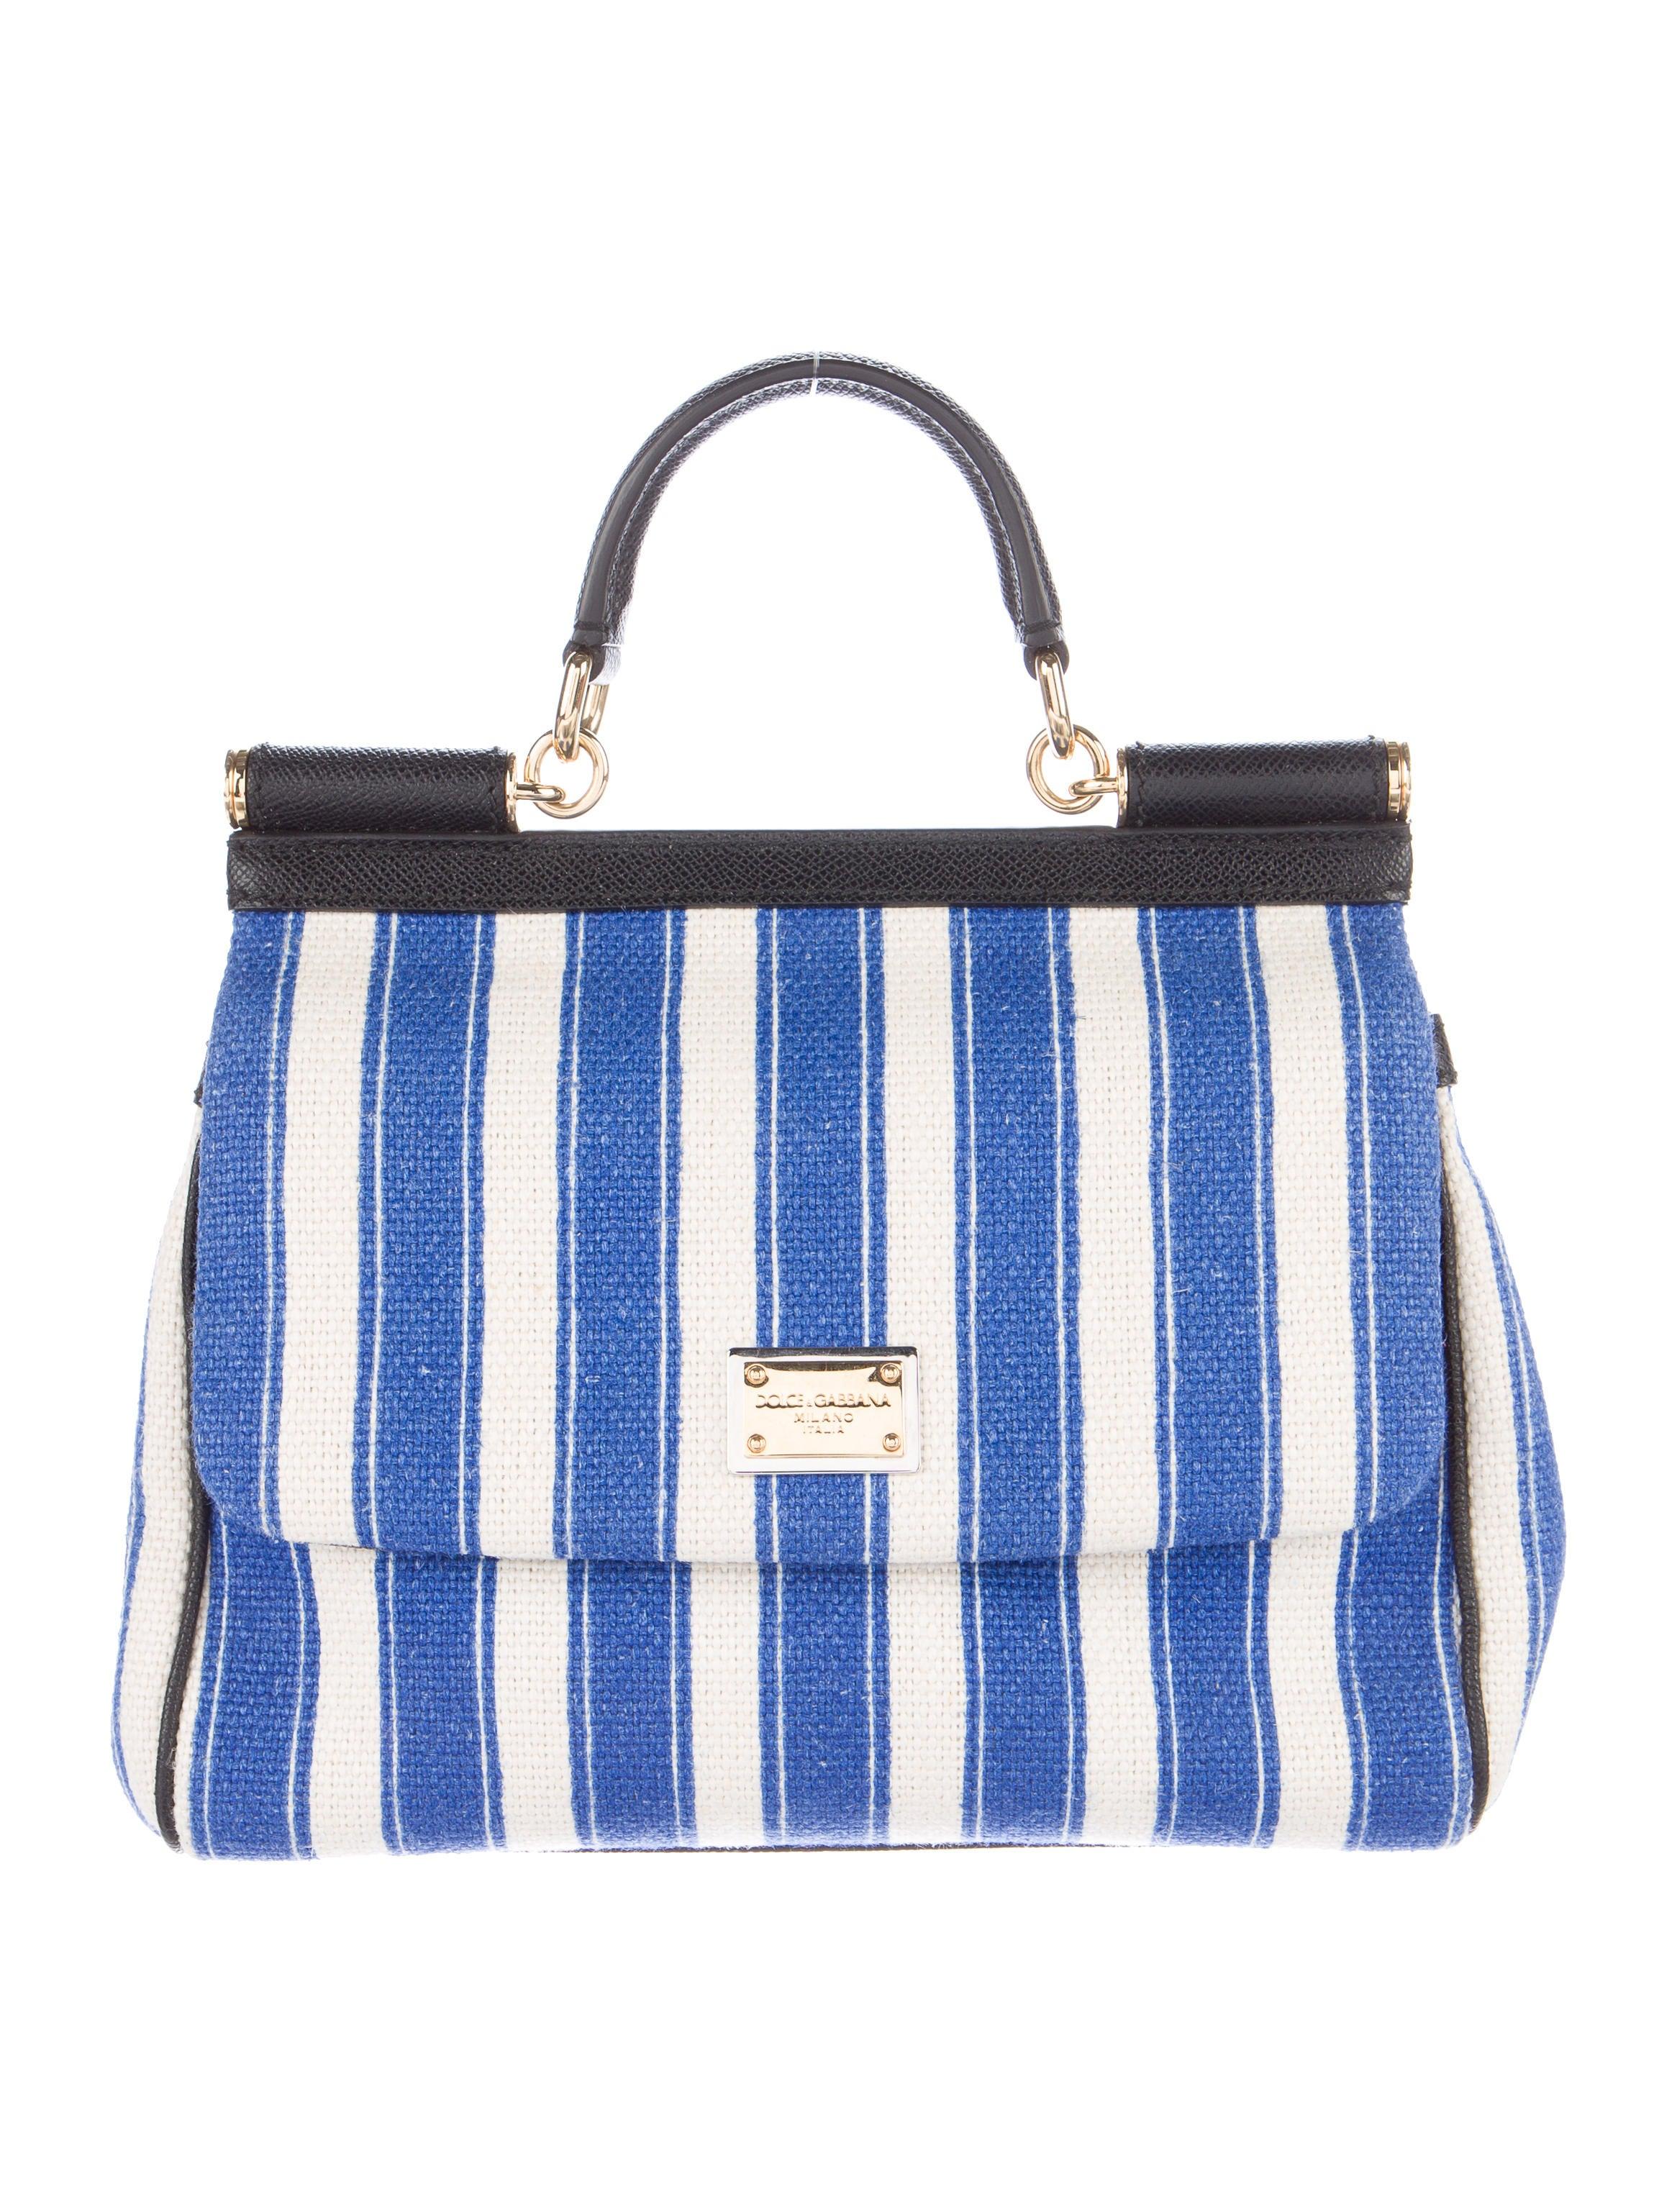 8d8a87fa75 Dolce   Gabbana Medium Striped Miss Sicily Bag - Handbags - DAG70452 ...